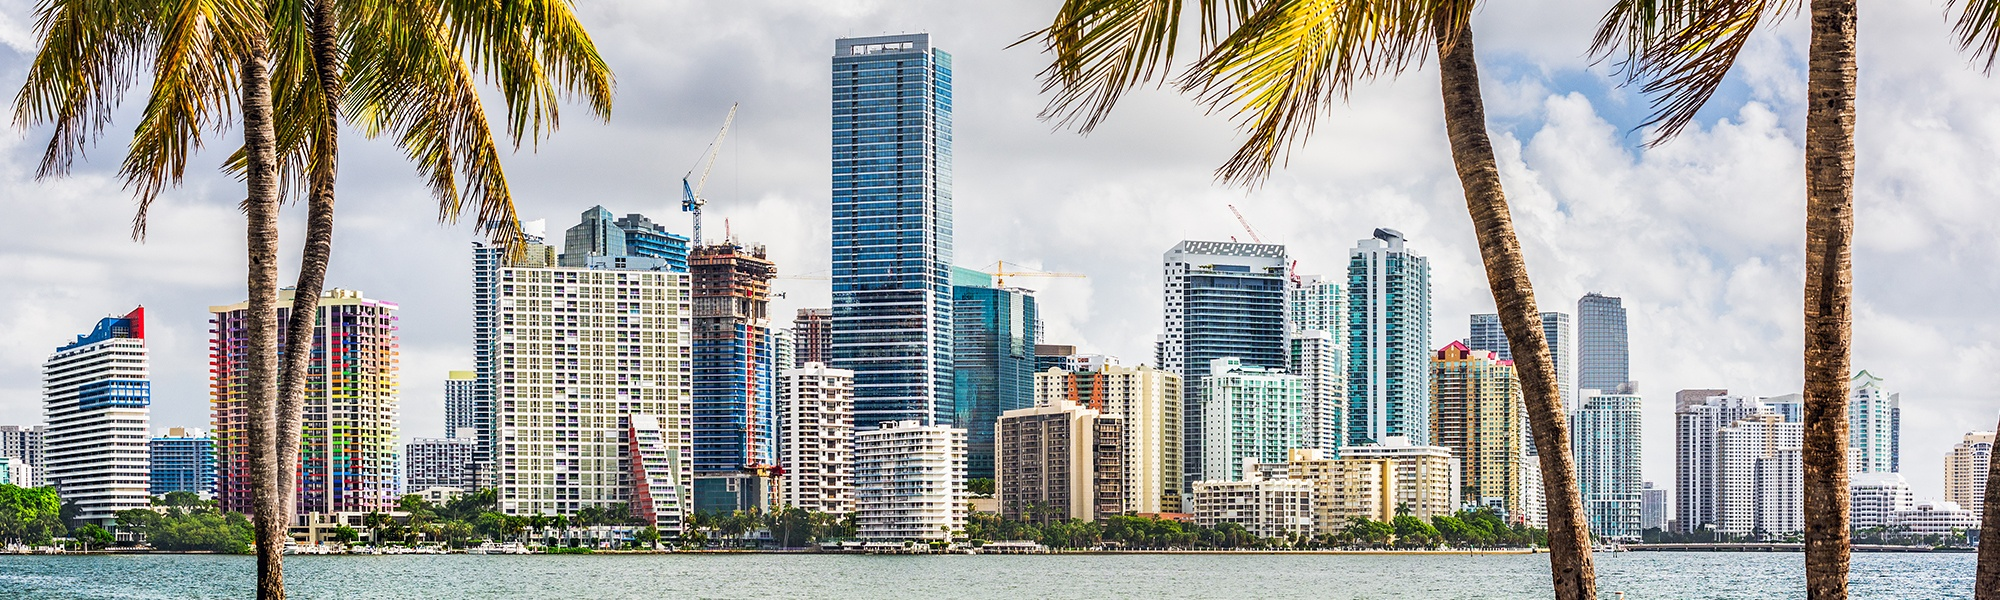 Miami_Crop.jpg